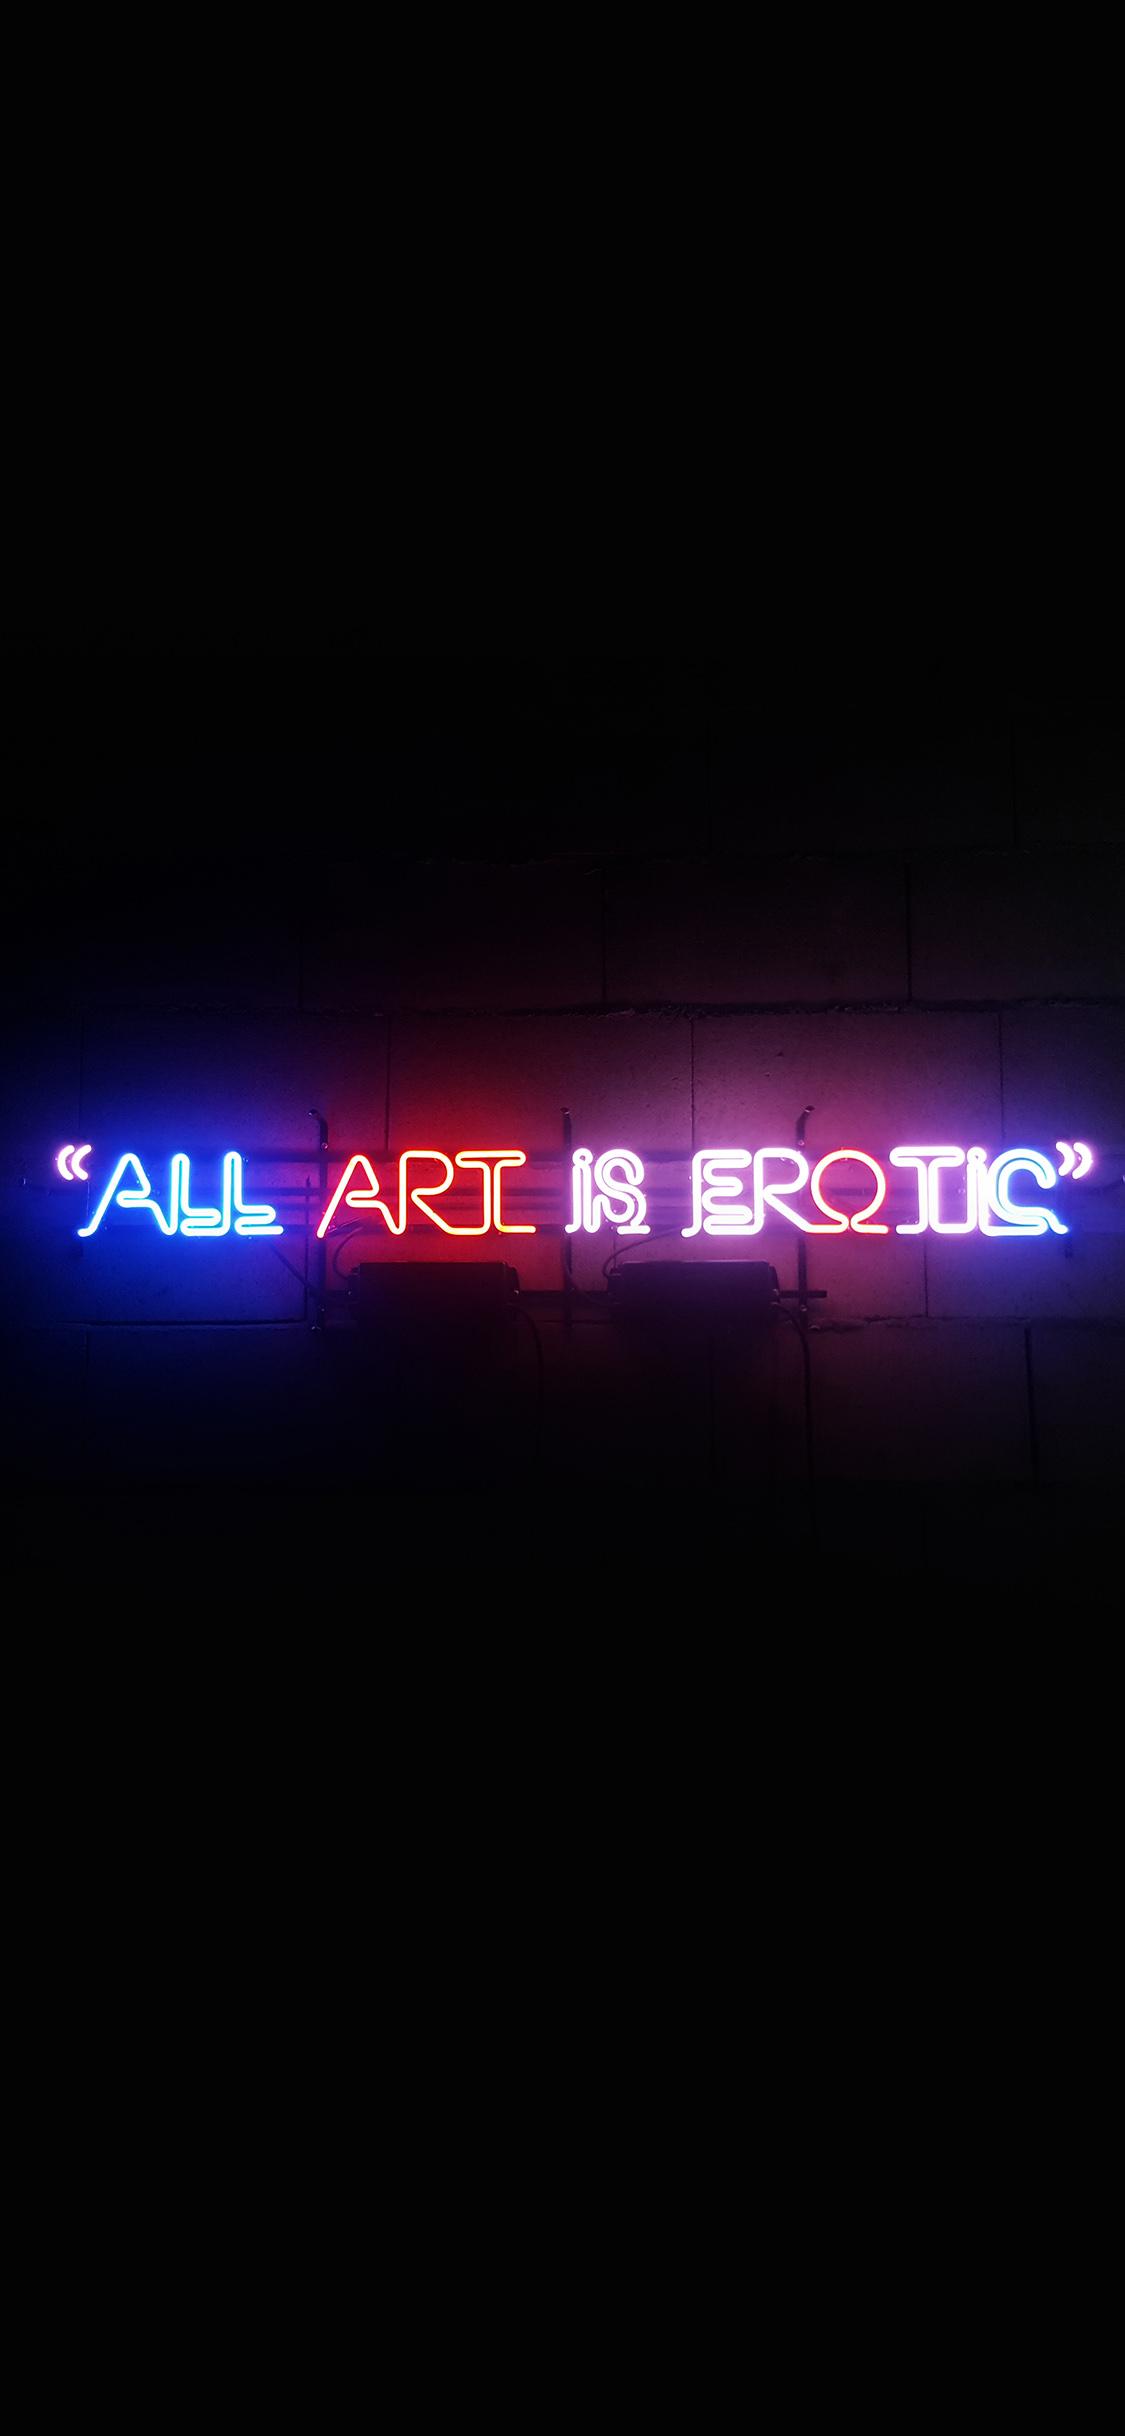 Erotic iphone wallpapers